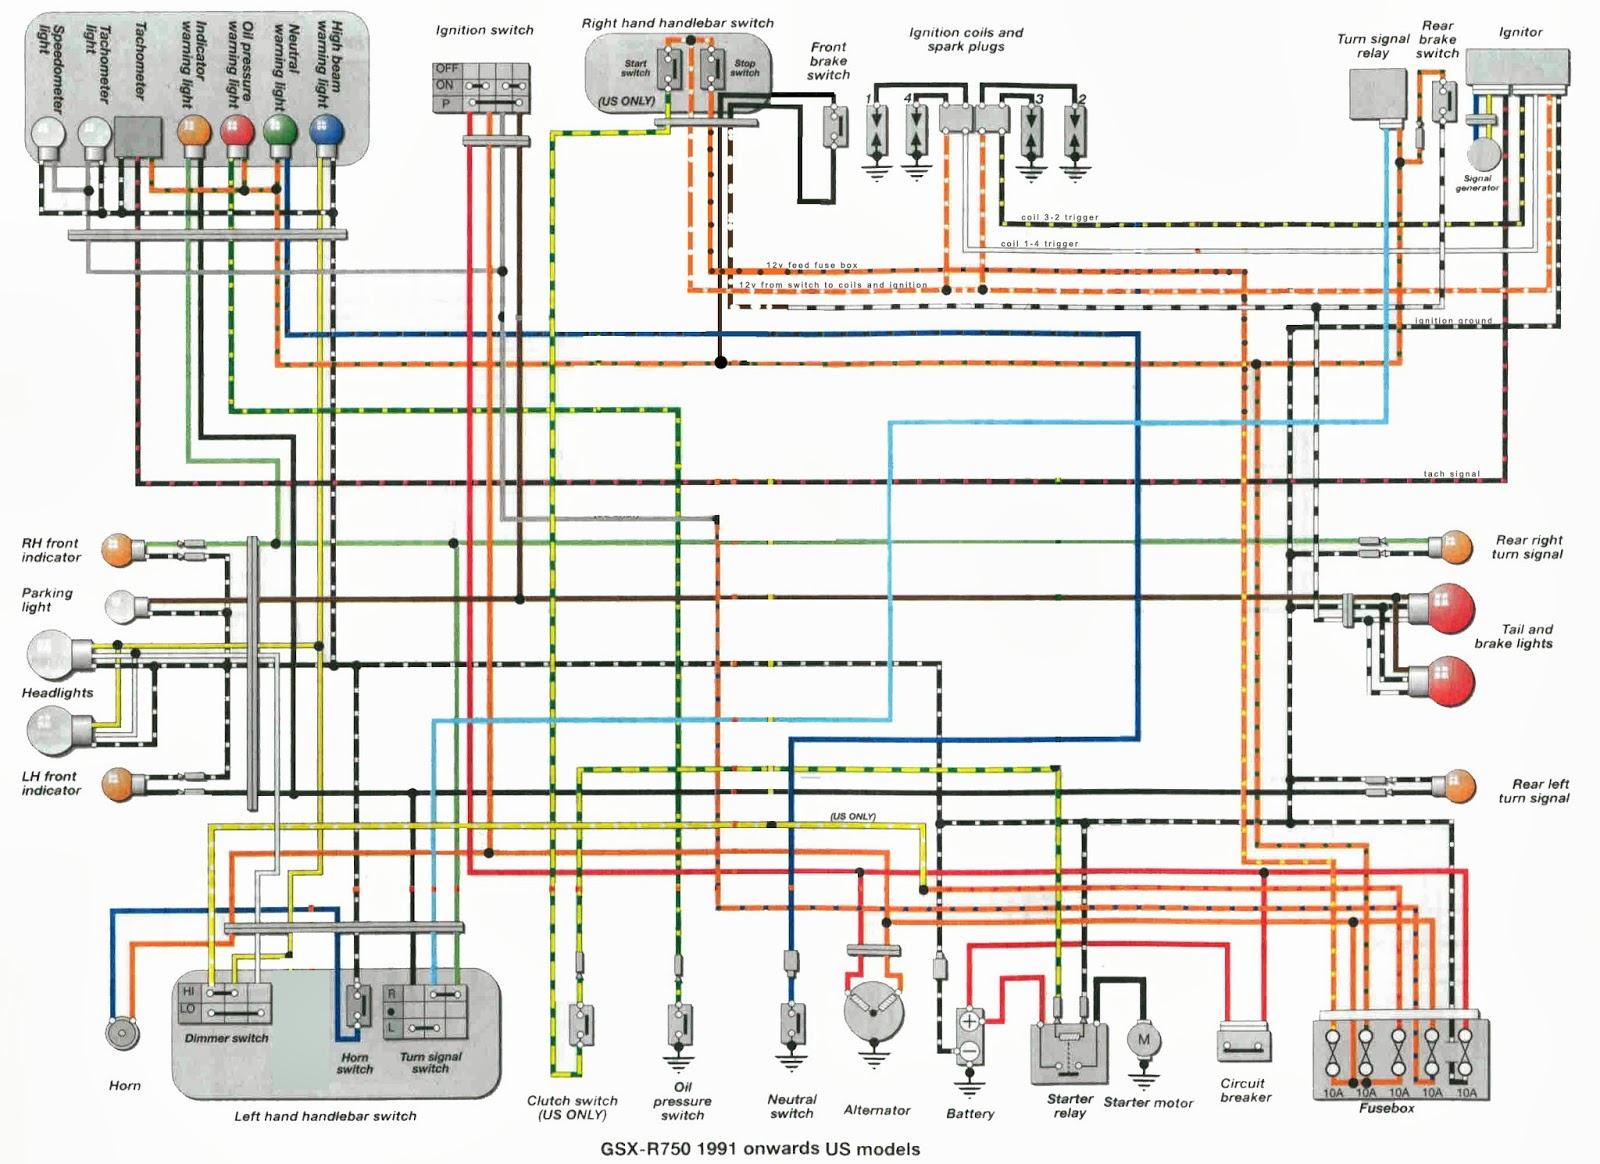 Suzuki Bandit 1200 Wiring Diagram from i0.wp.com